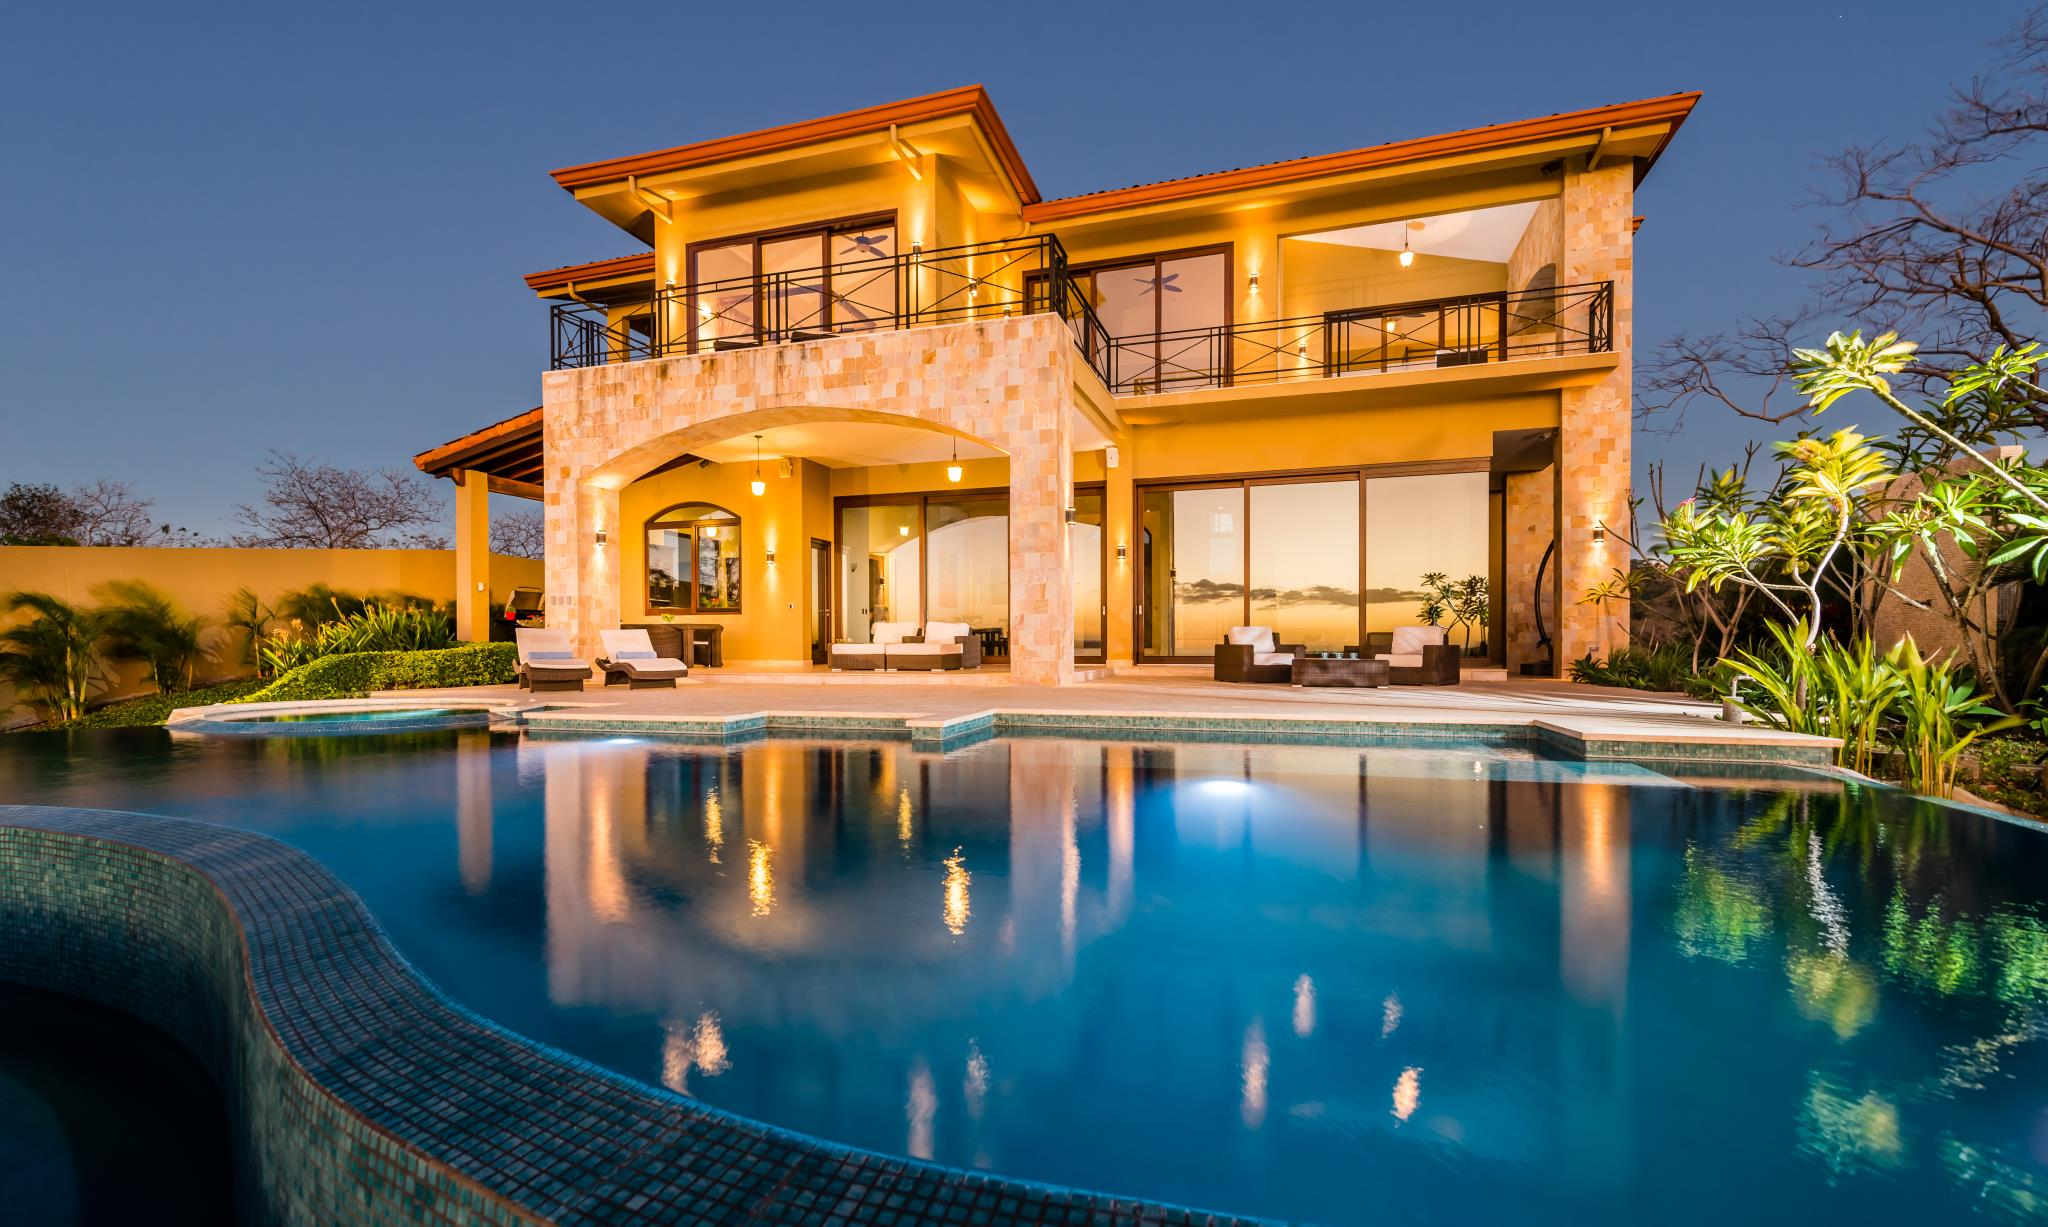 Tamarindo Beach Sunset Villa In Costa Rica US $ 3,900,000 See It